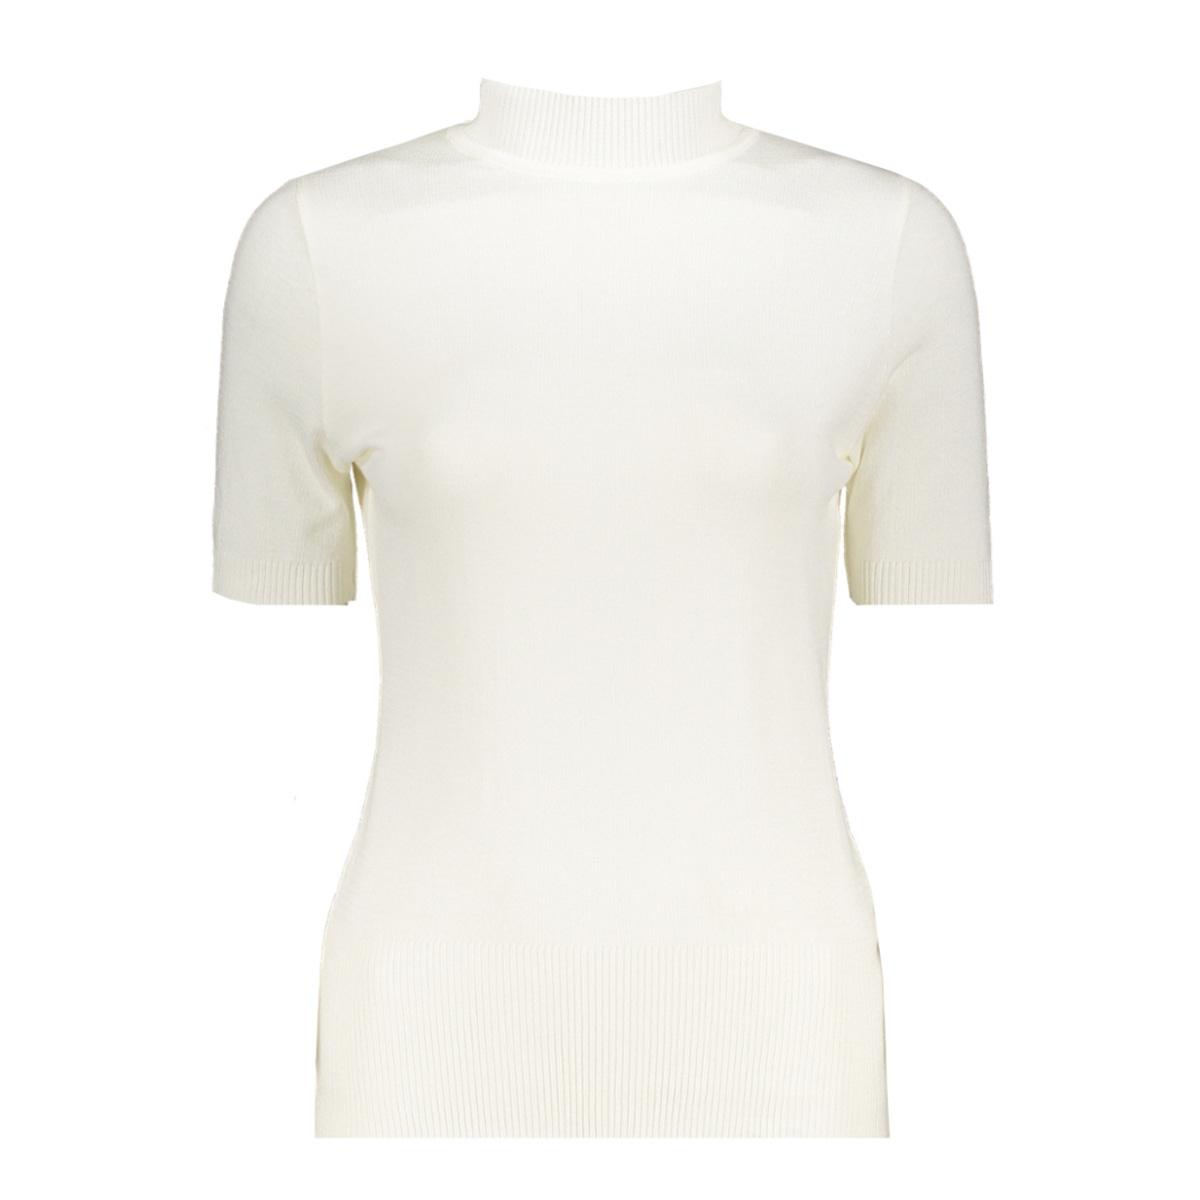 marnix short sleeve rollneck zoso t-shirt off white